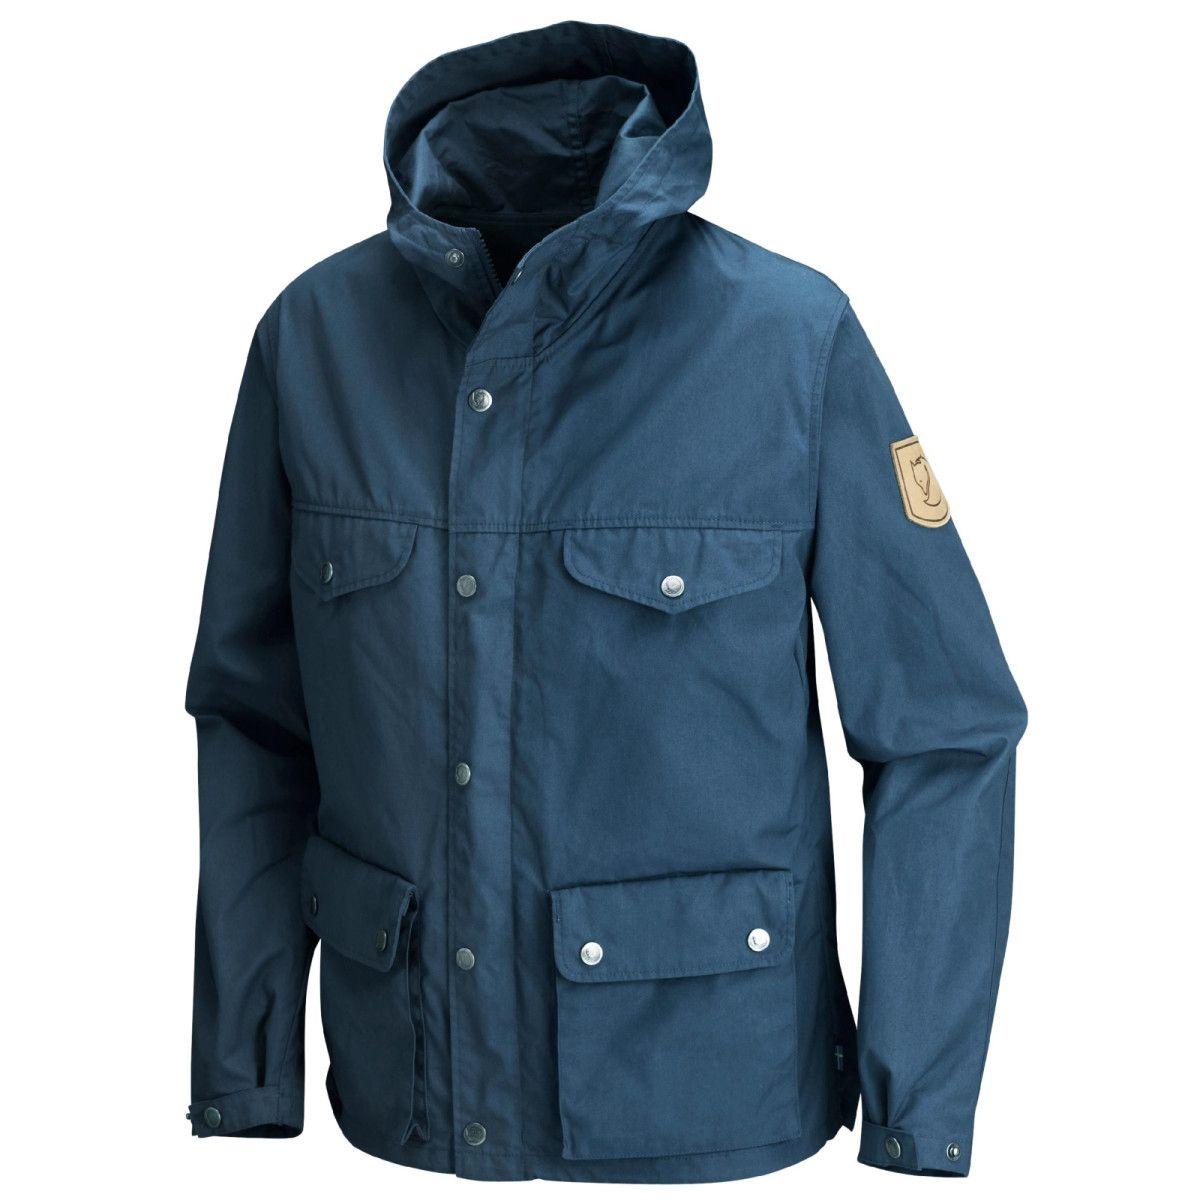 Greenland Jacket W | Damjackor, Damtröja, Kläder